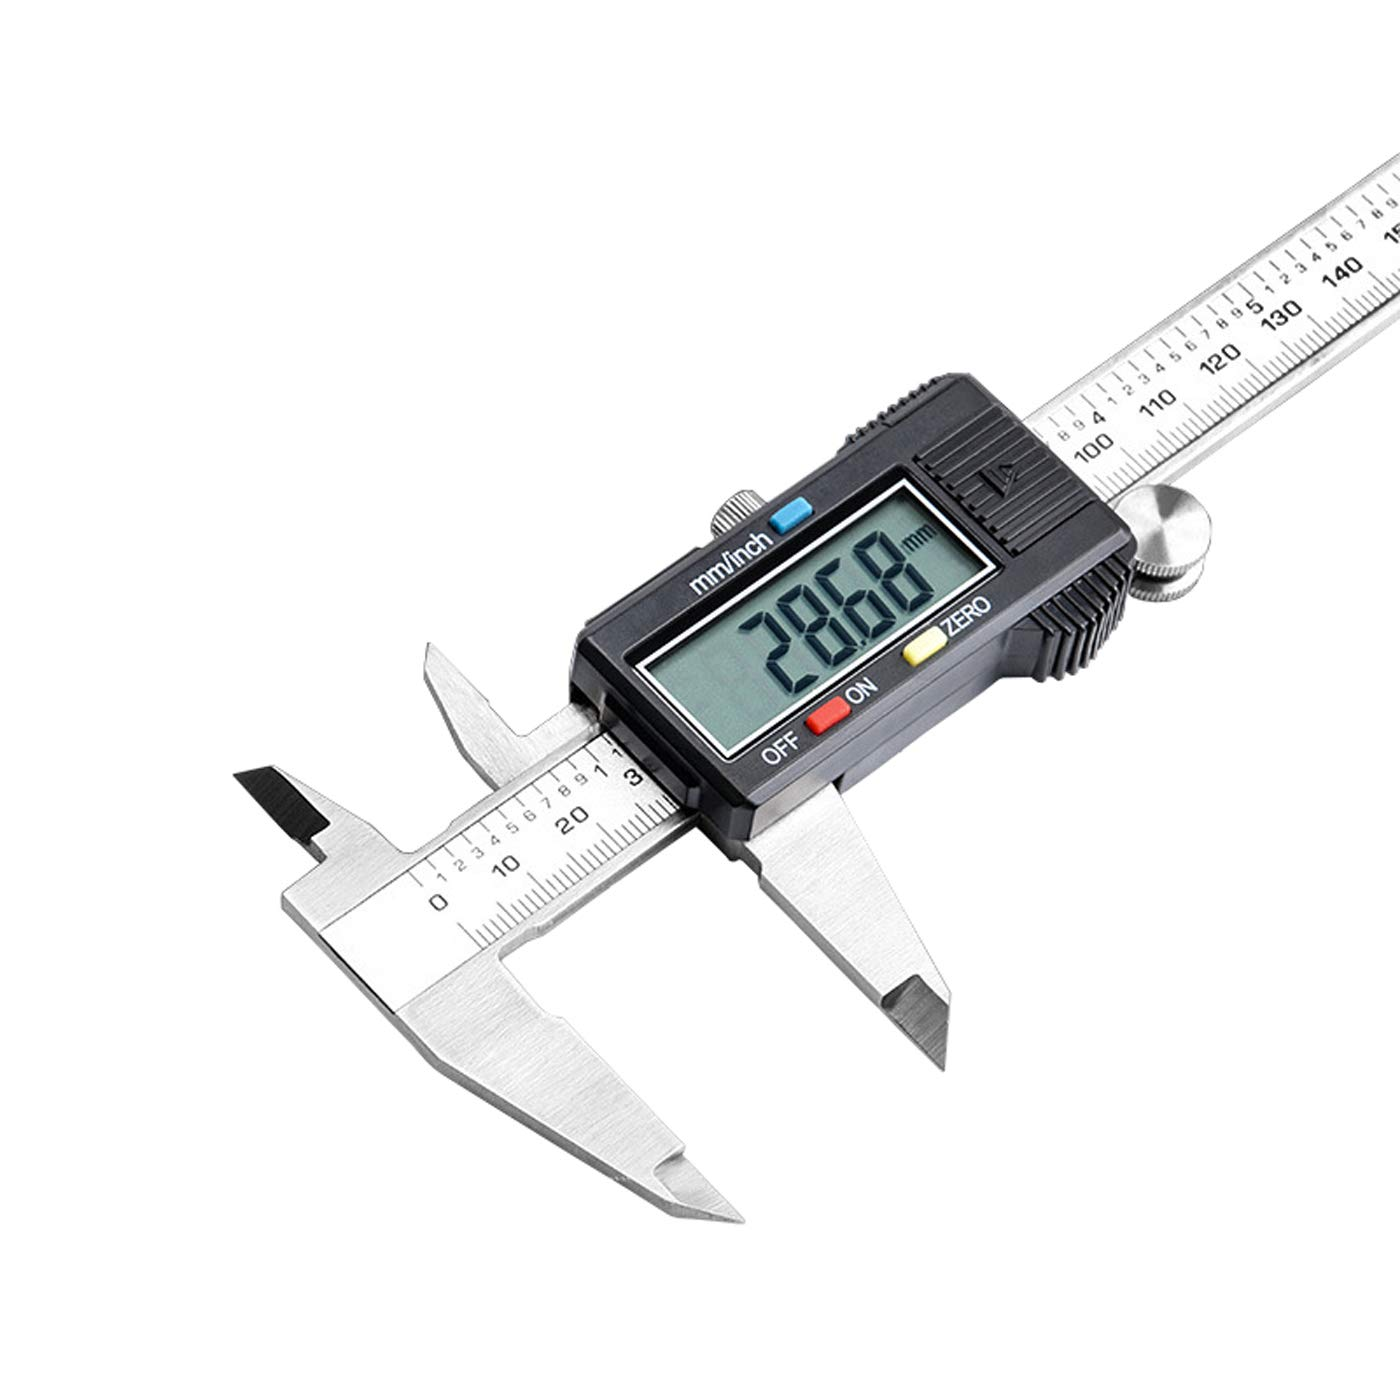 Digital Vernier Caliper Inch Metric Fractions Conversion Stainless Steel